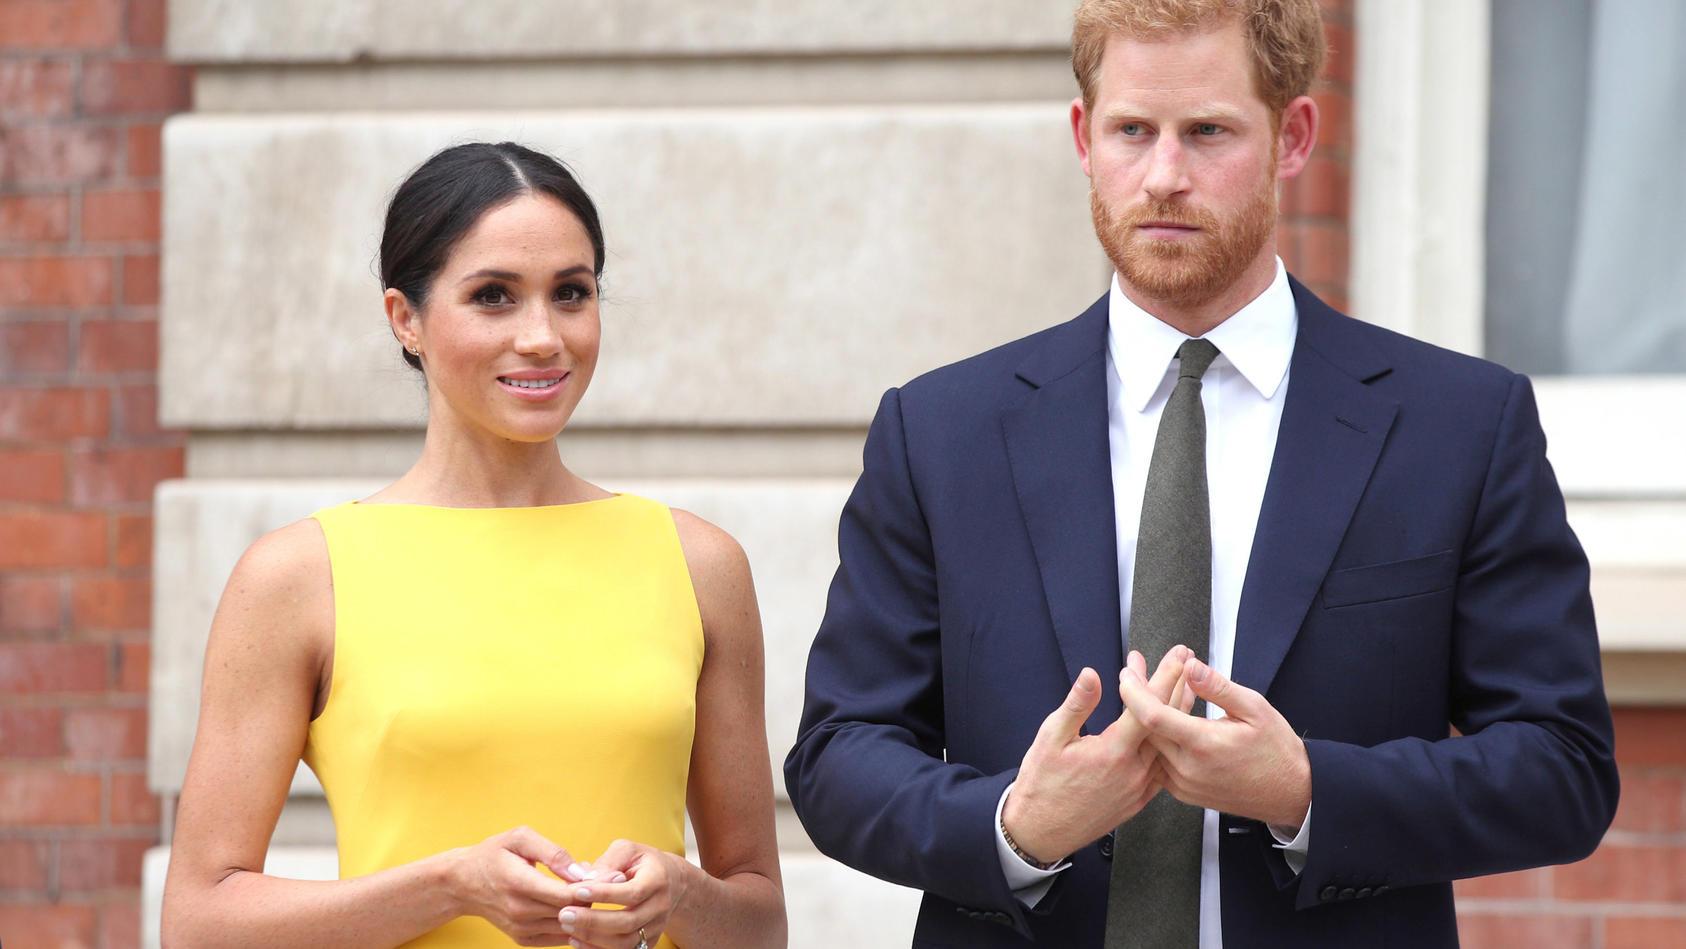 Herzogin Meghan und Prinz Harry verkündeten im Januar 2020 den sogenannten Megxit.